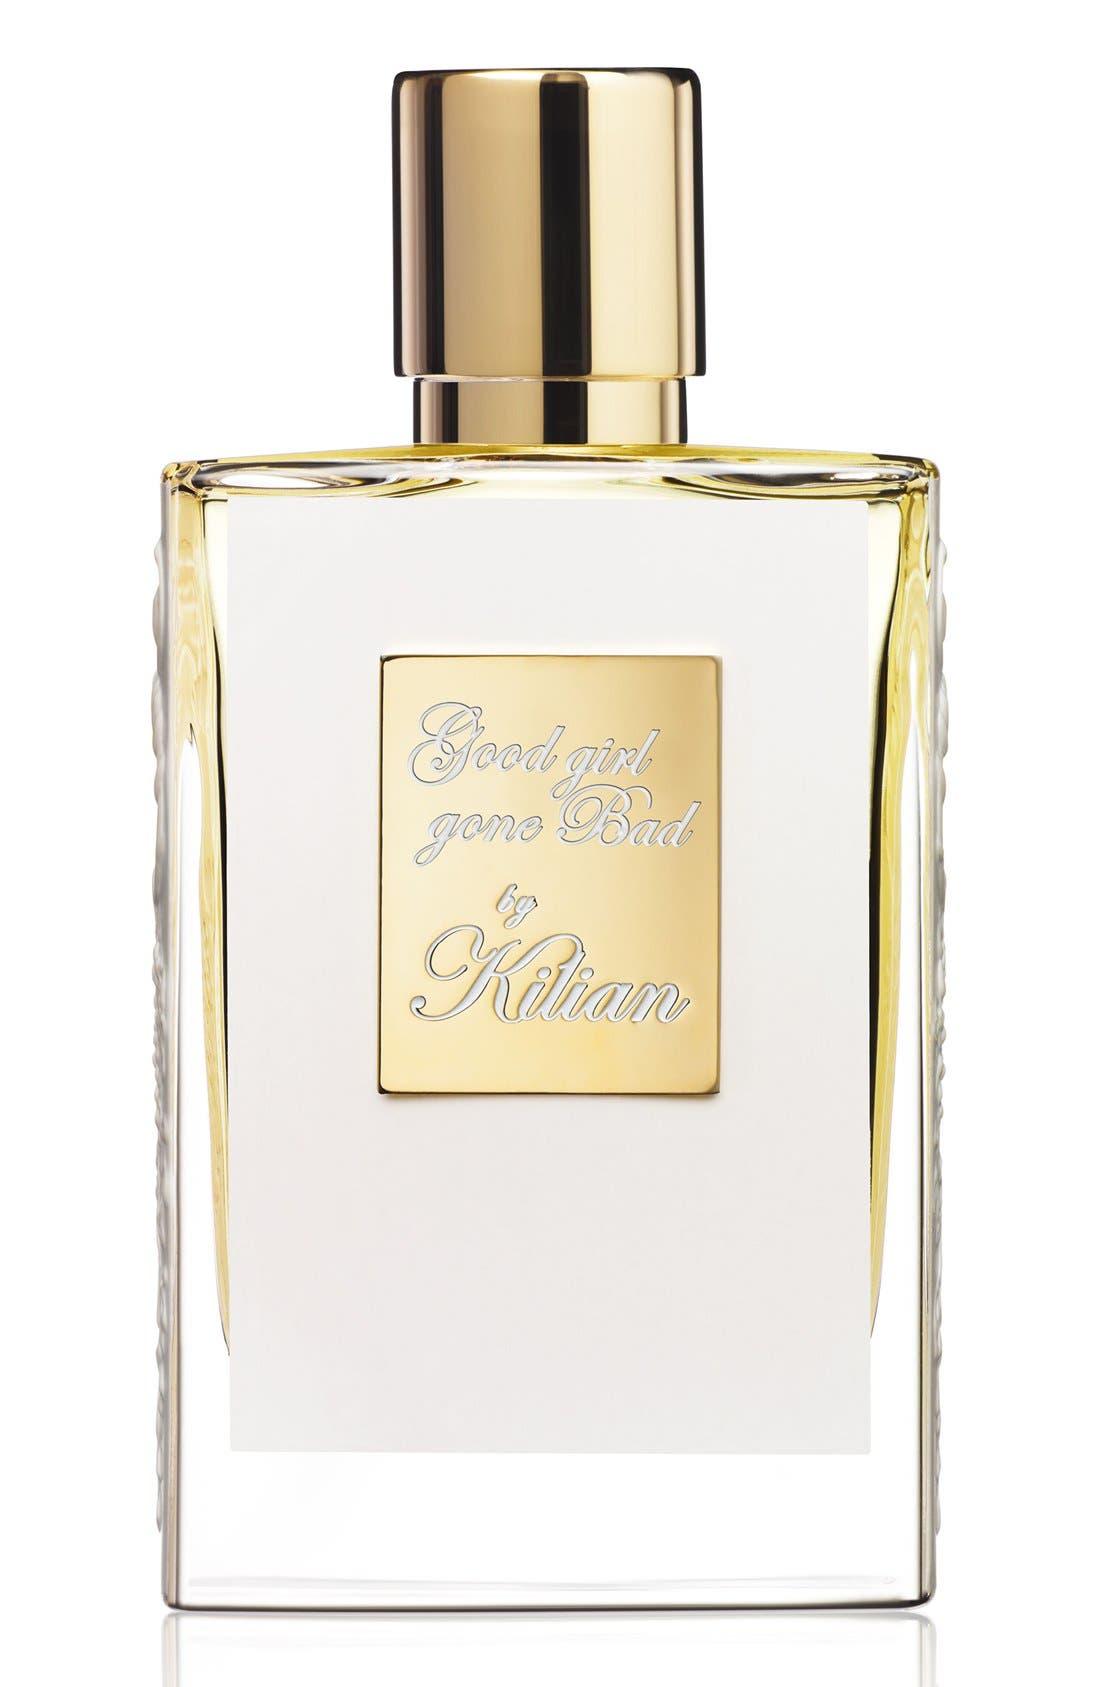 KILIAN, In the Garden of Good and Evil Good girl gone Bad Refillable Fragrance Spray, Alternate thumbnail 4, color, NO COLOR